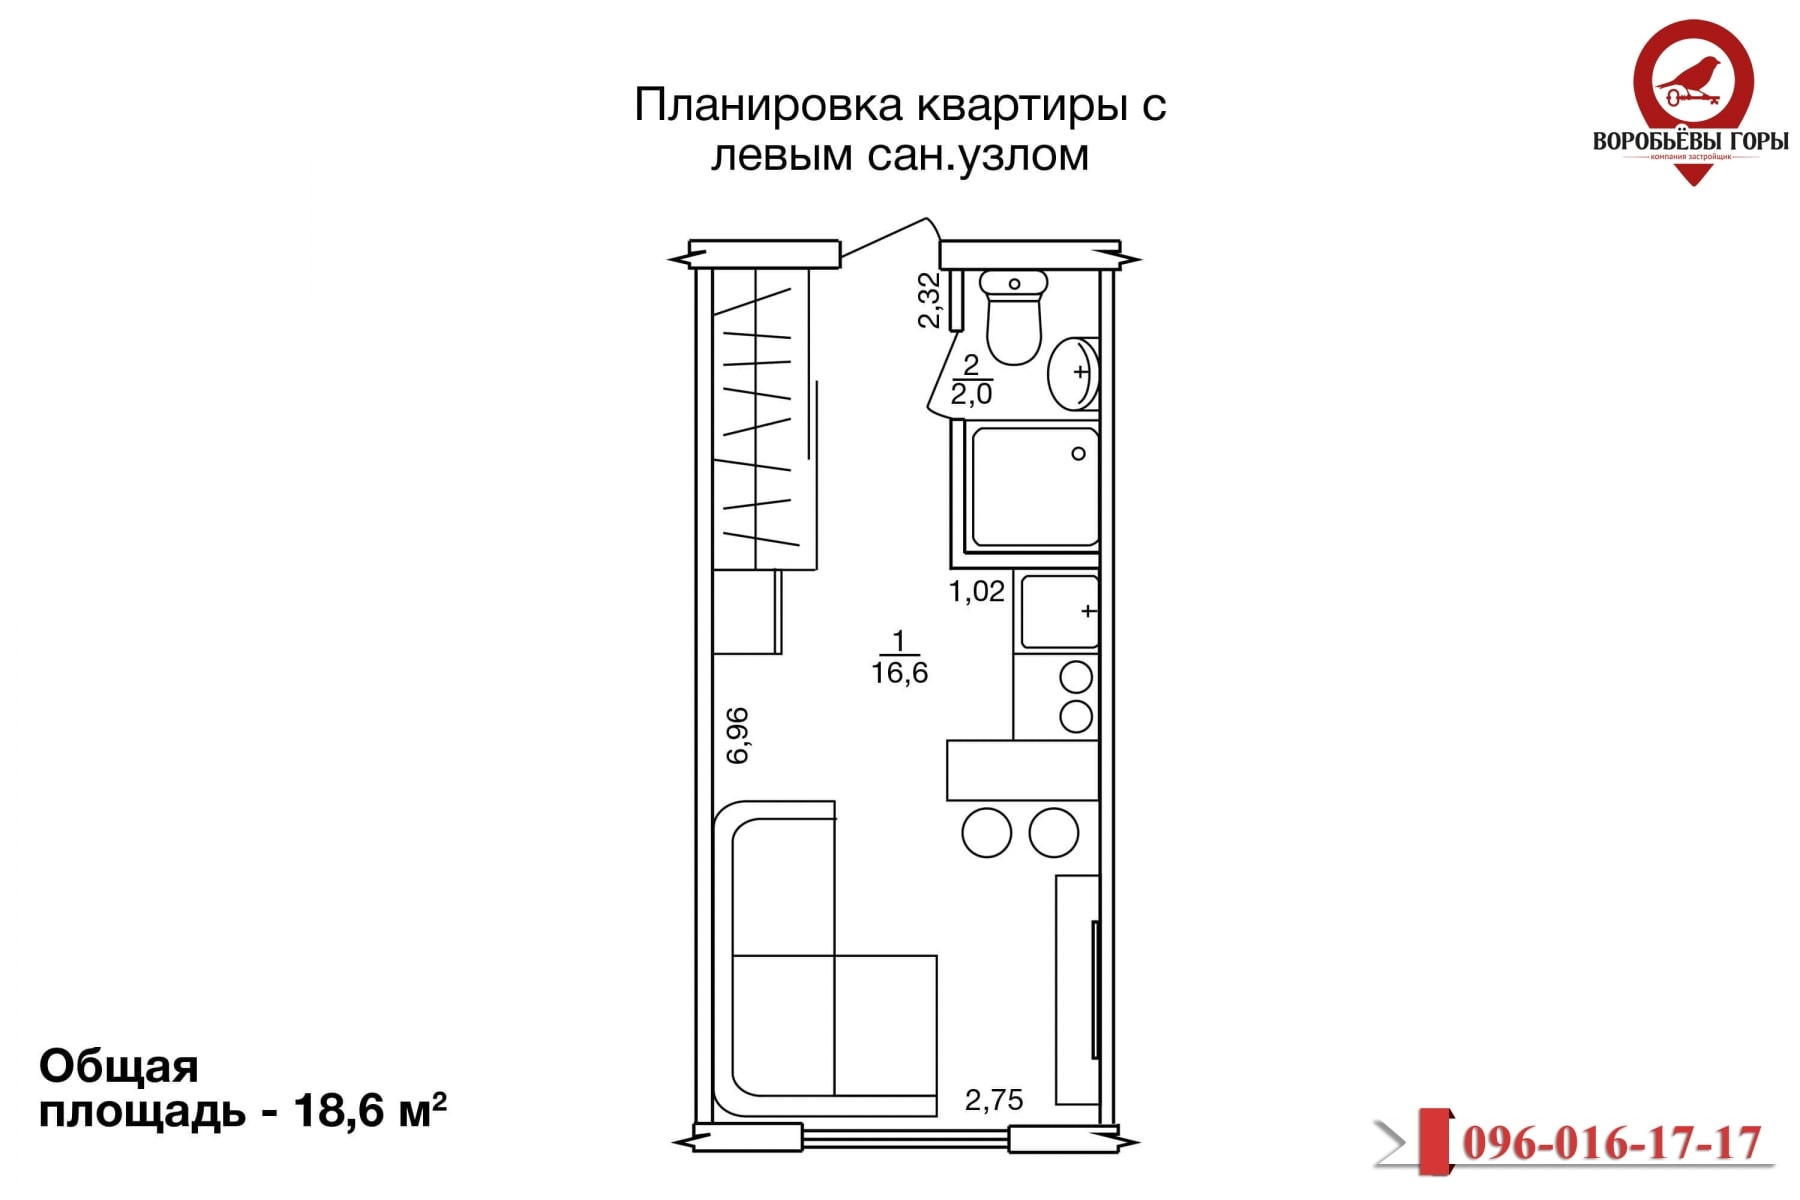 двухуровневая квартира 19м2